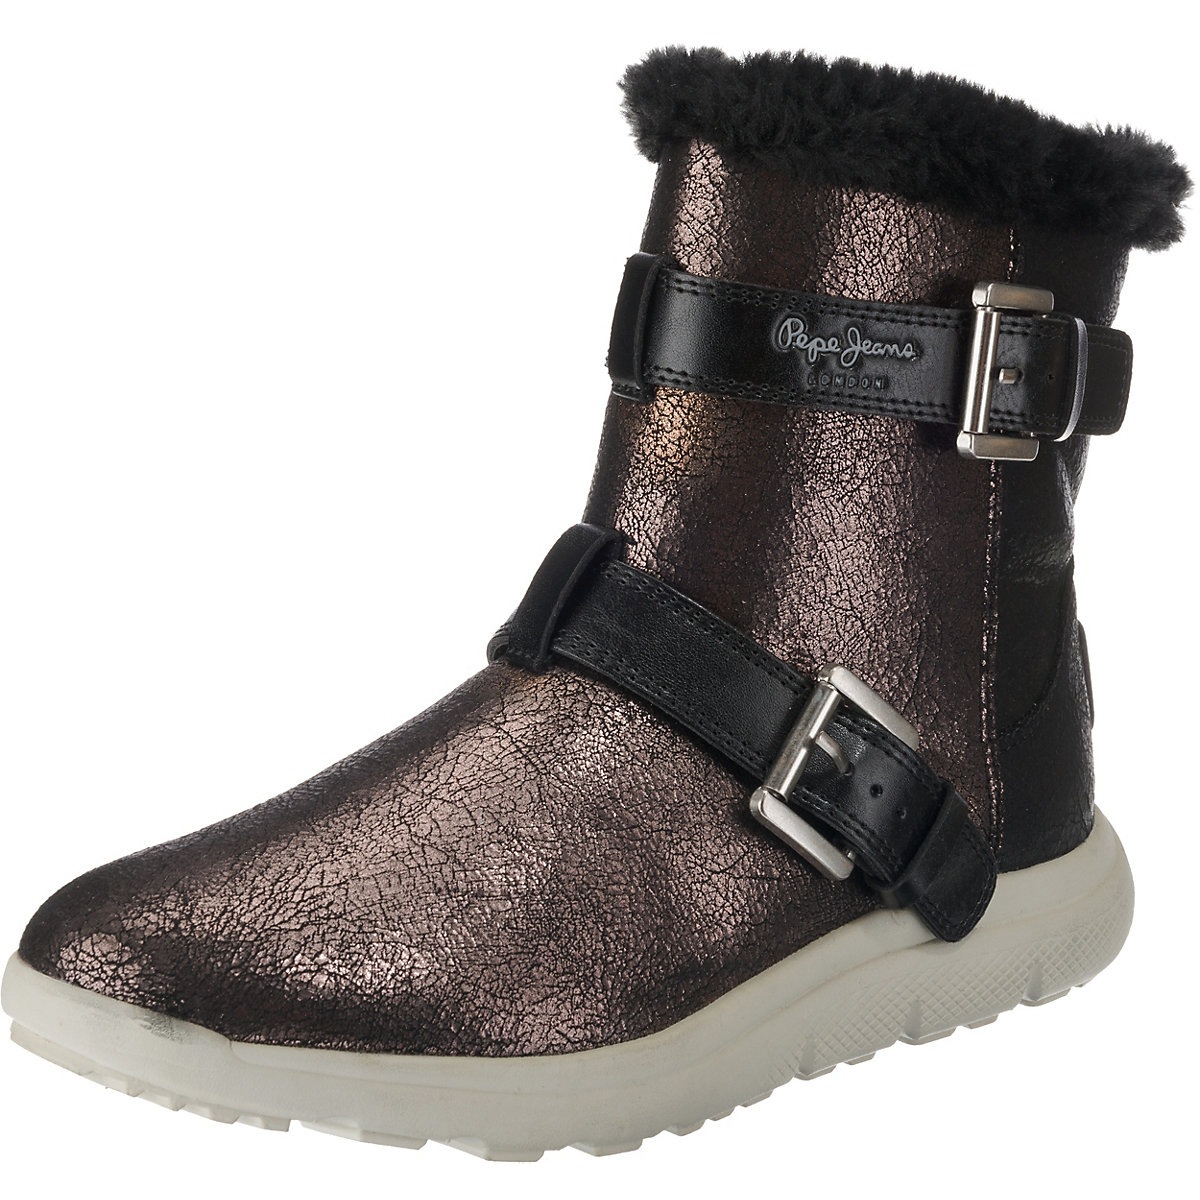 Pepe Jeans, HYKE W SNOW Winterstiefeletten, dunkelgrau  Gute Qualität beliebte Schuhe